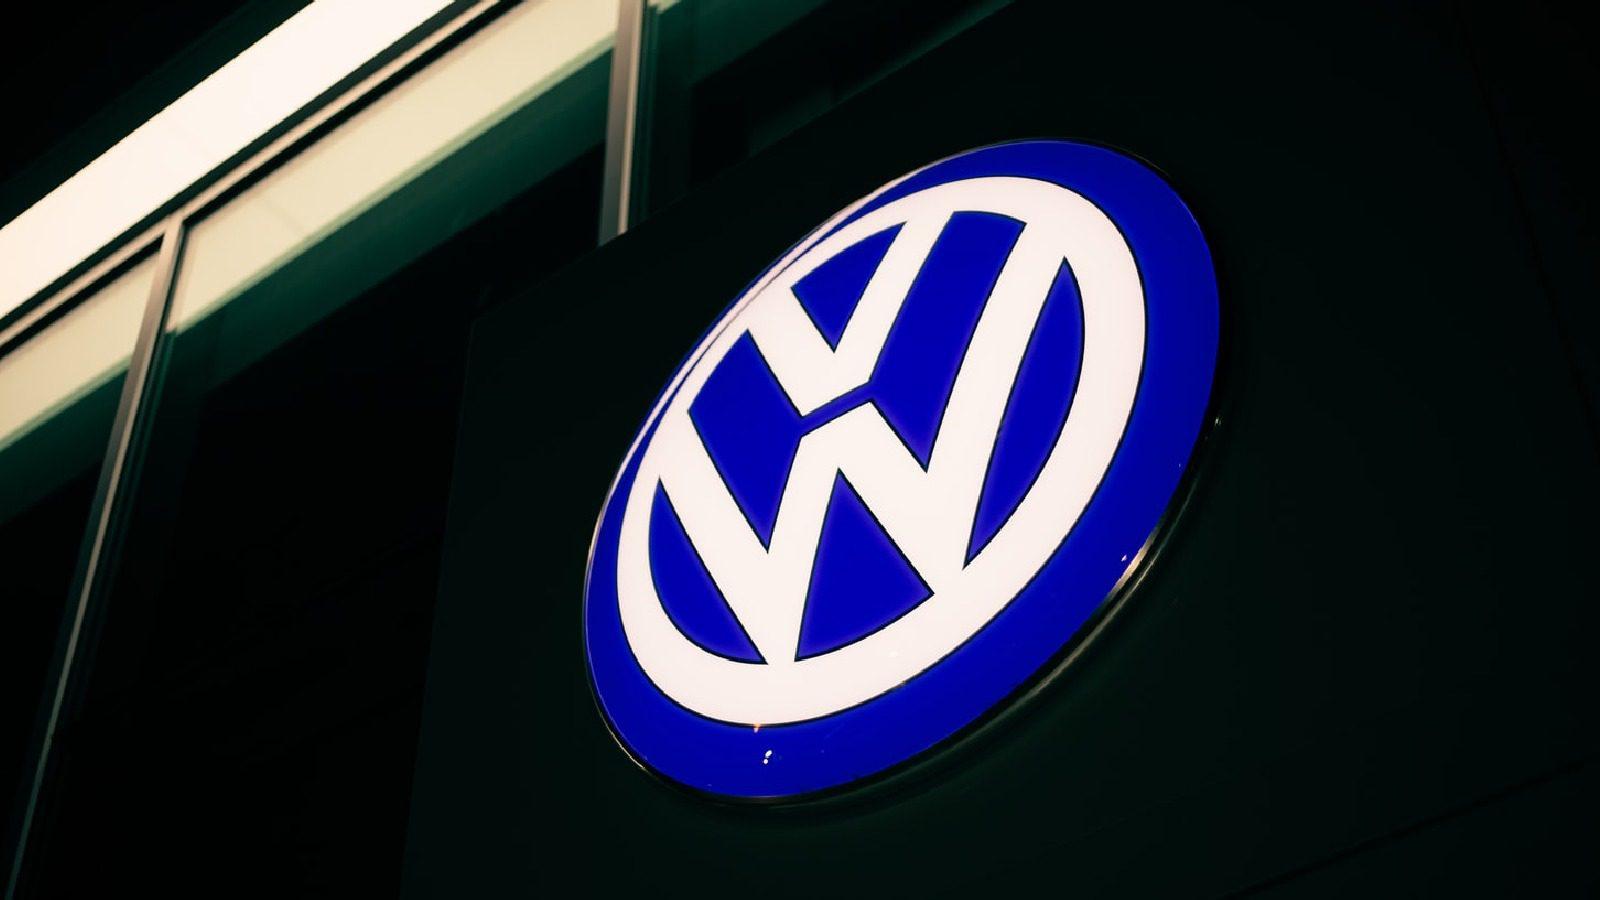 Volkswagen Laying Off